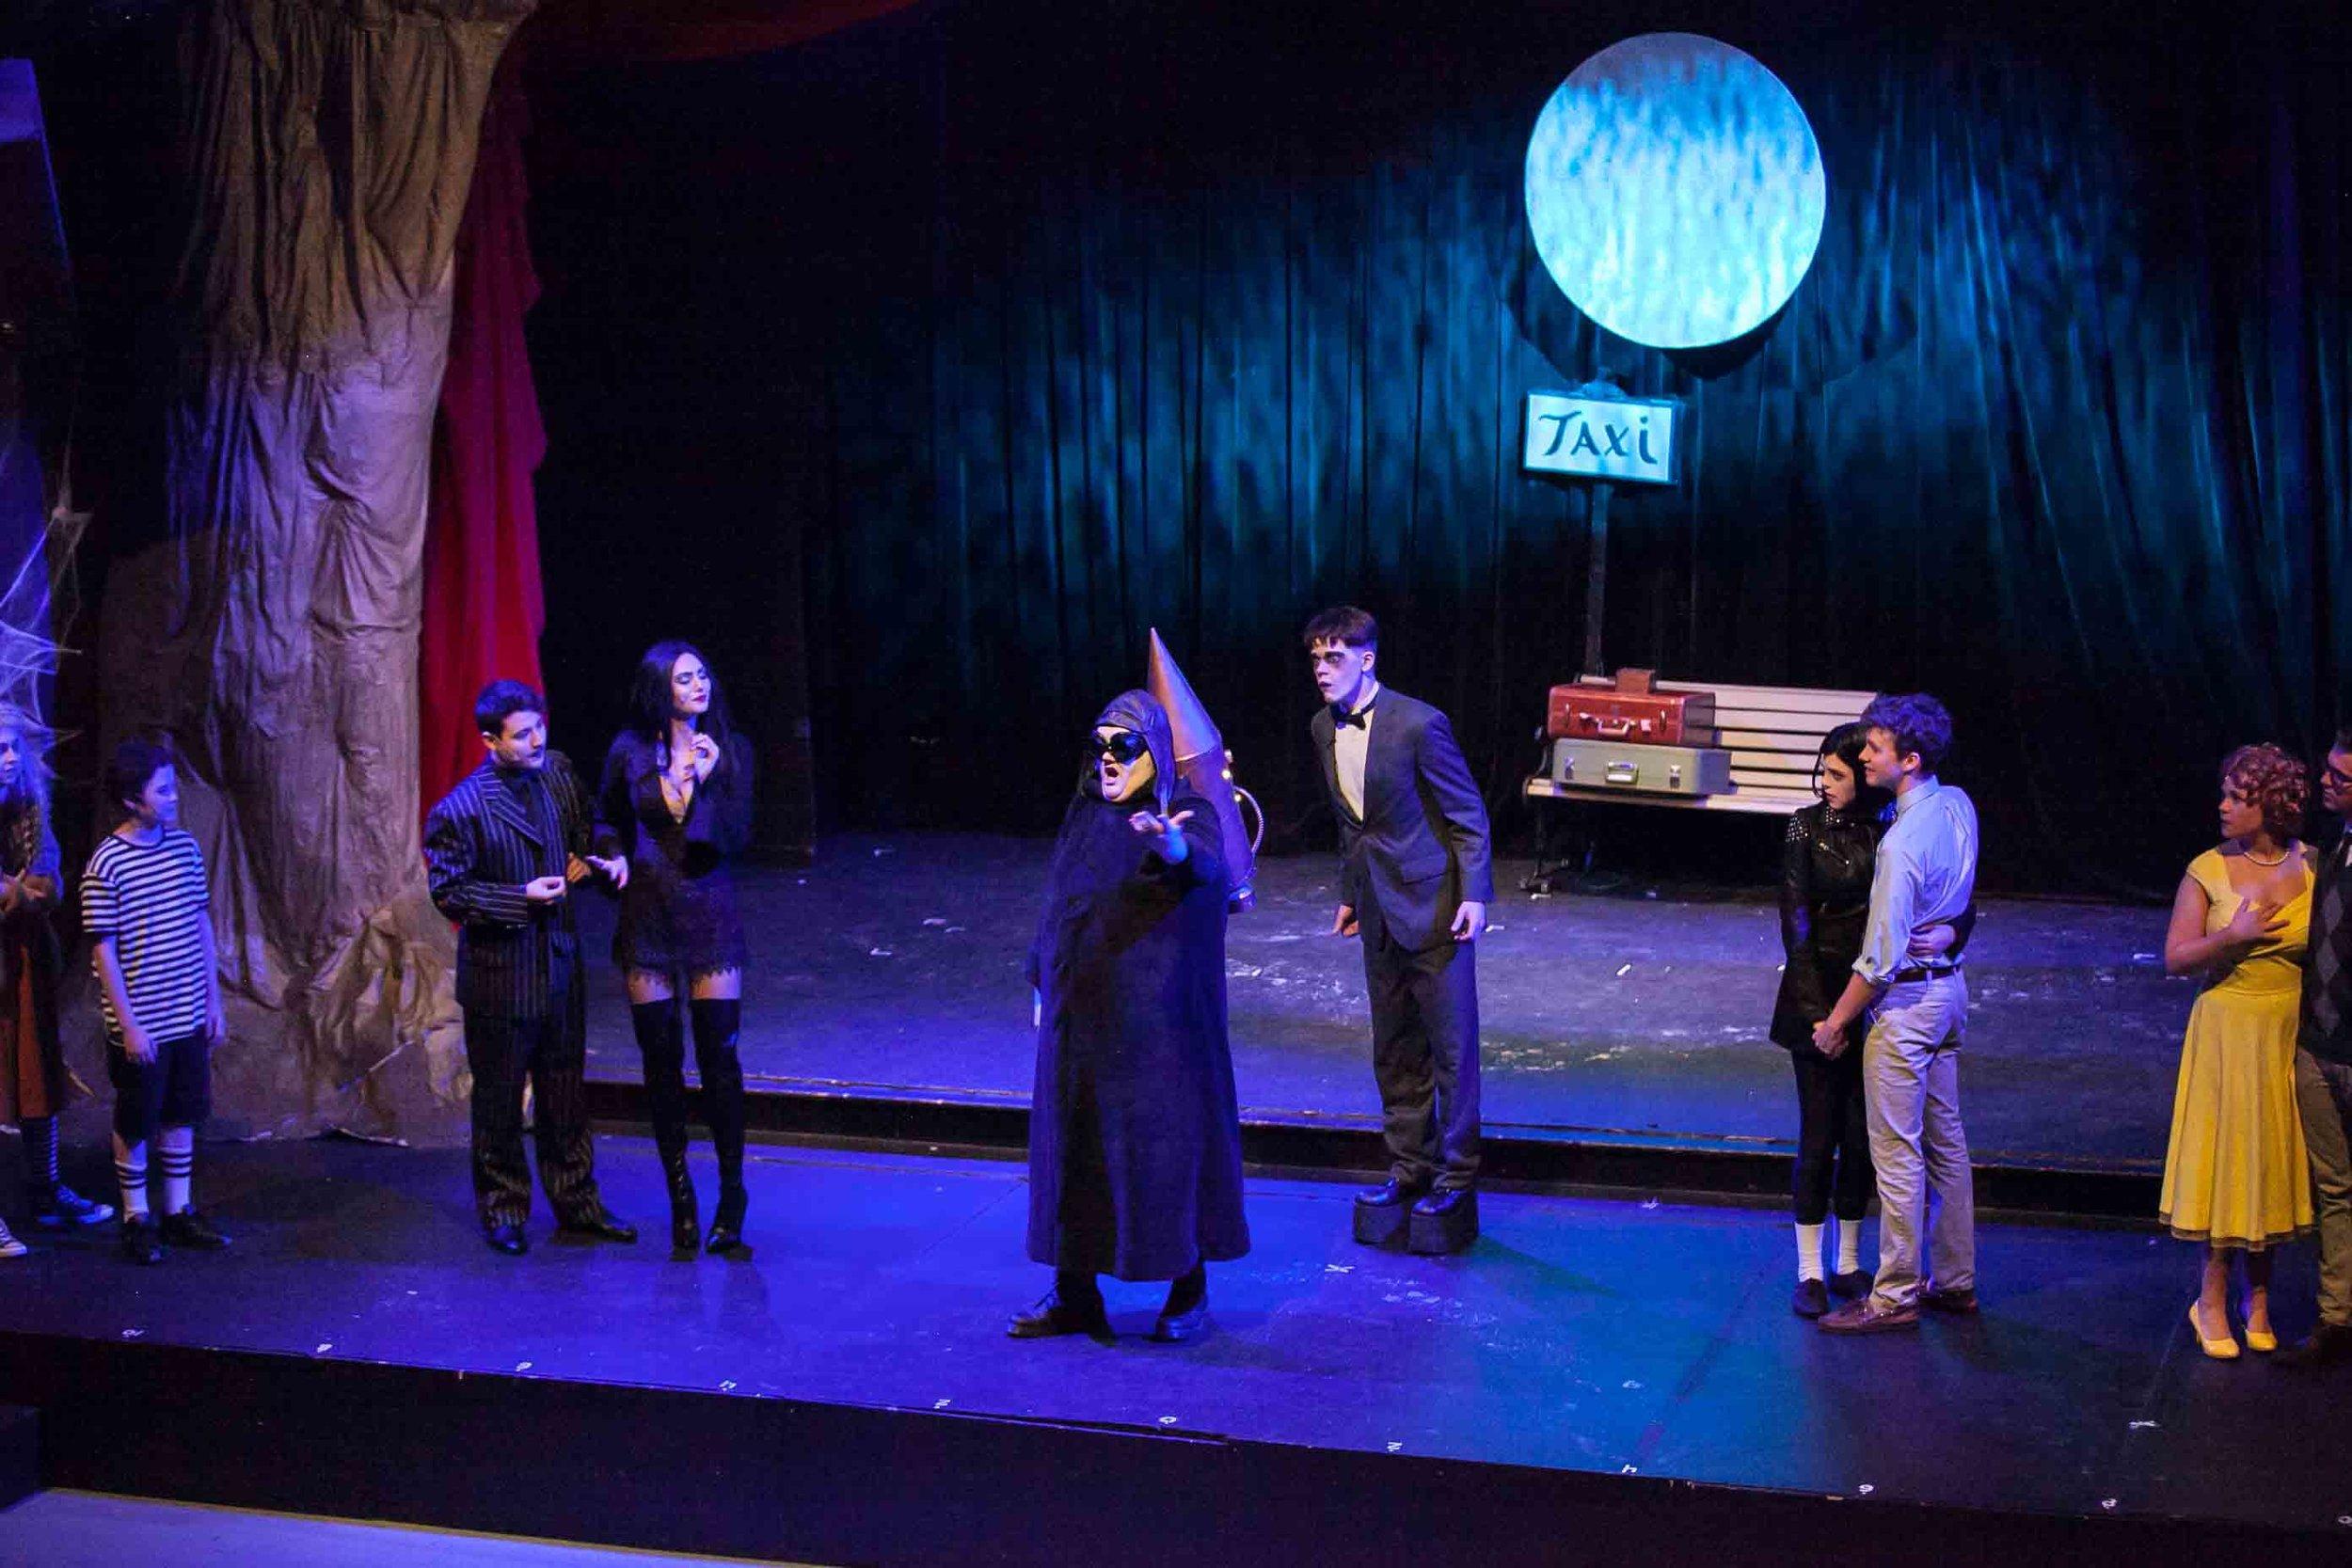 6-19-16 Addams Family Kooky Cast 0426.jpg